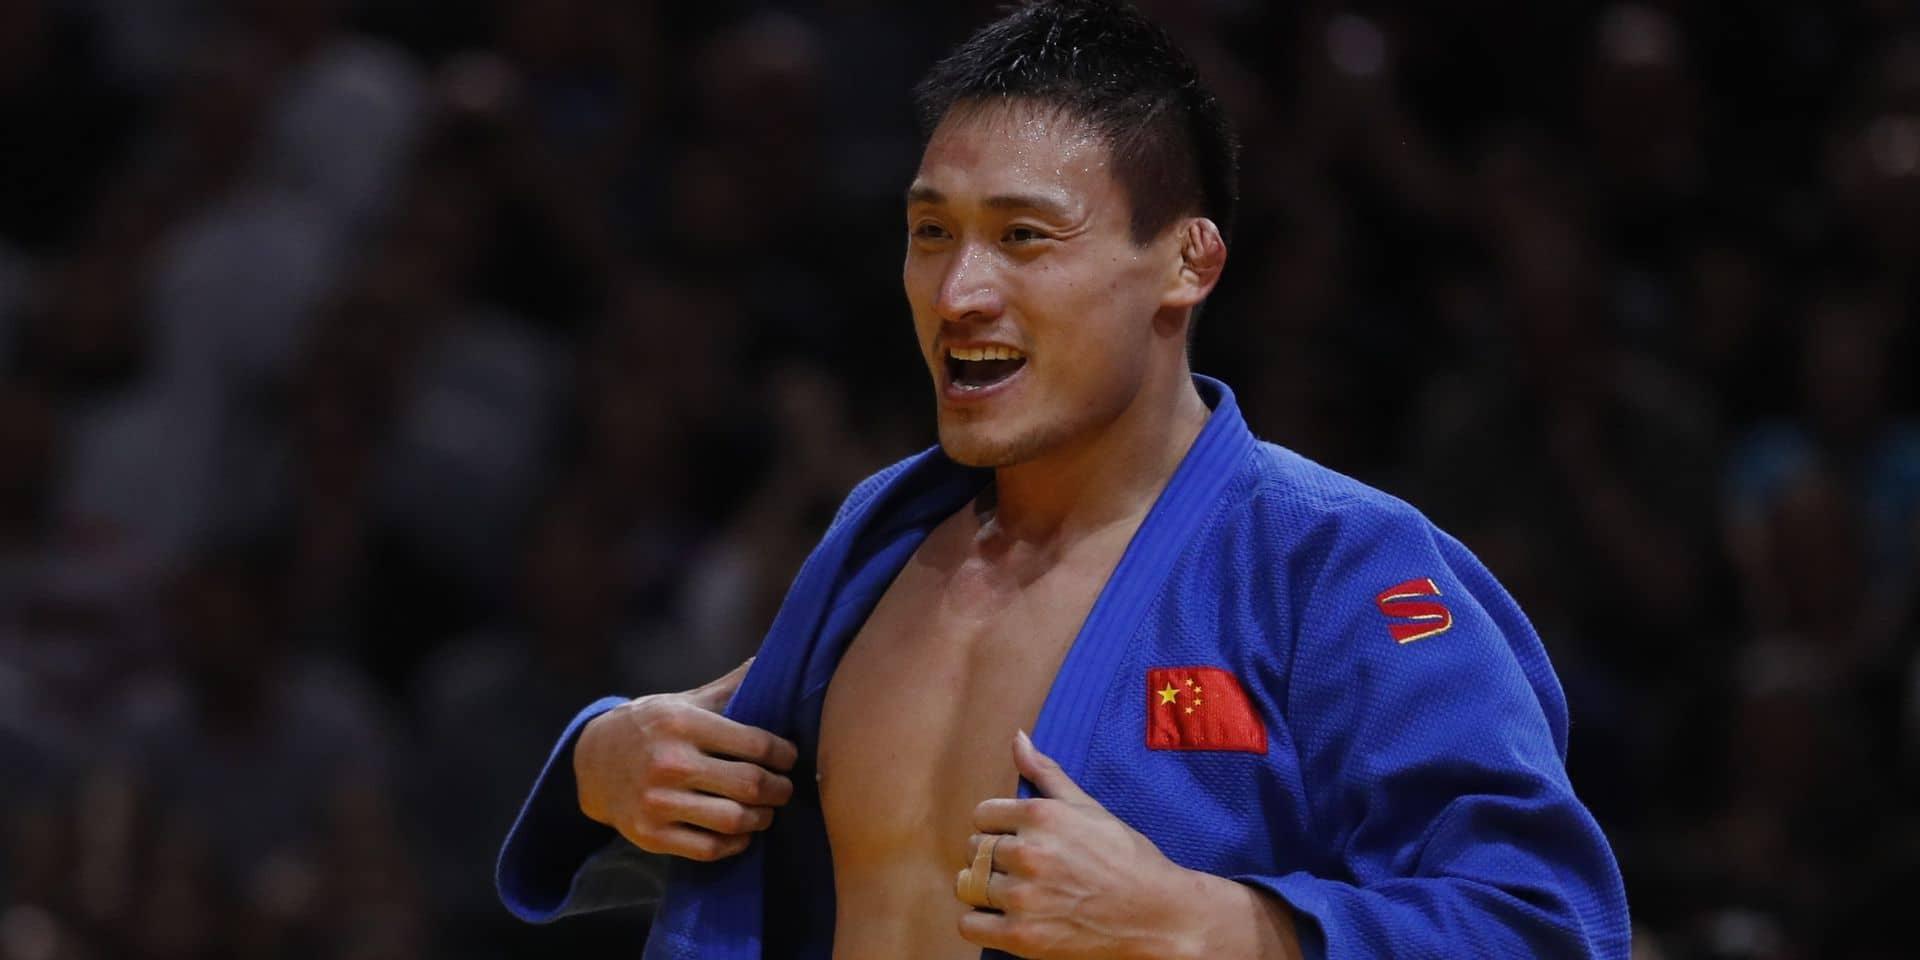 Coronavirus : pas de judokas chinois, ce week-end, à Paris !